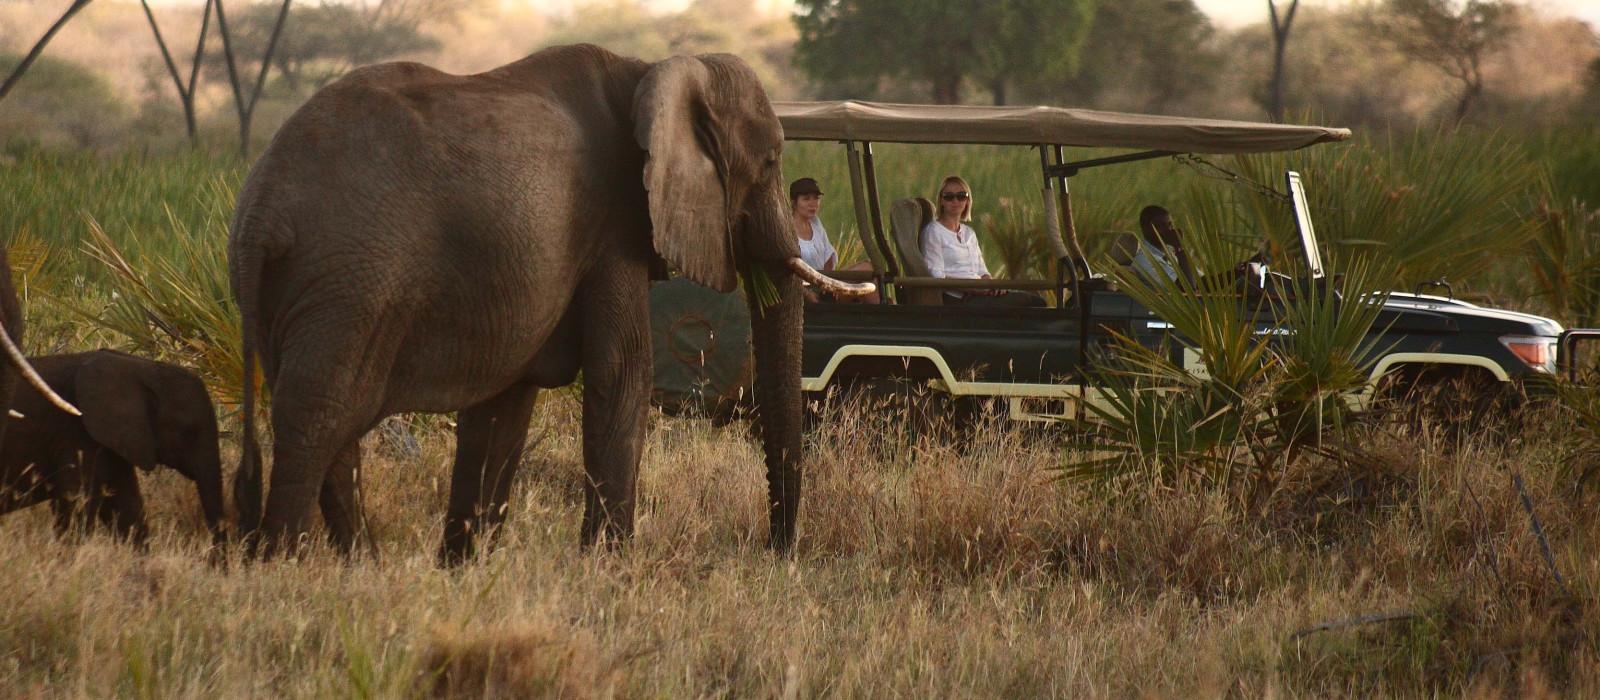 Kenia – Abseits bekannter Pfade Urlaub 1